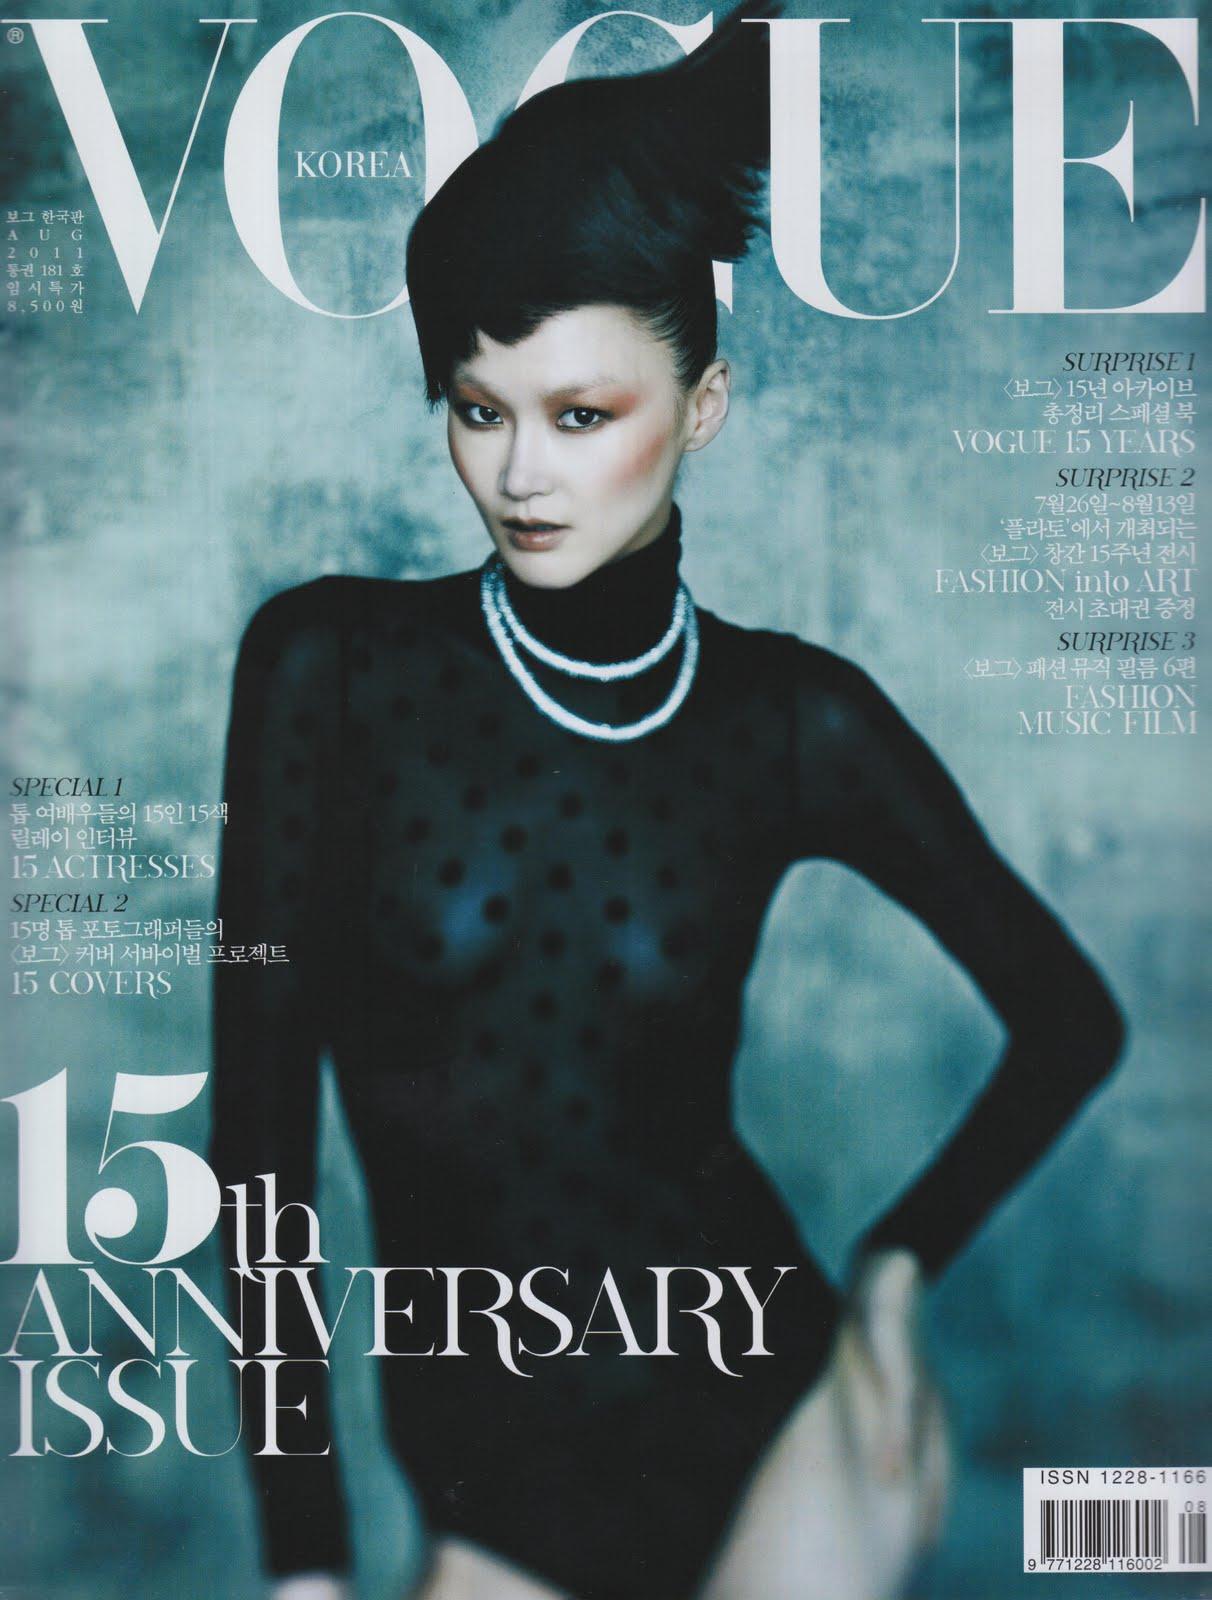 Six covers of vogue korea 15th anniversary art8amby 39 s blog for Anniversary magazine